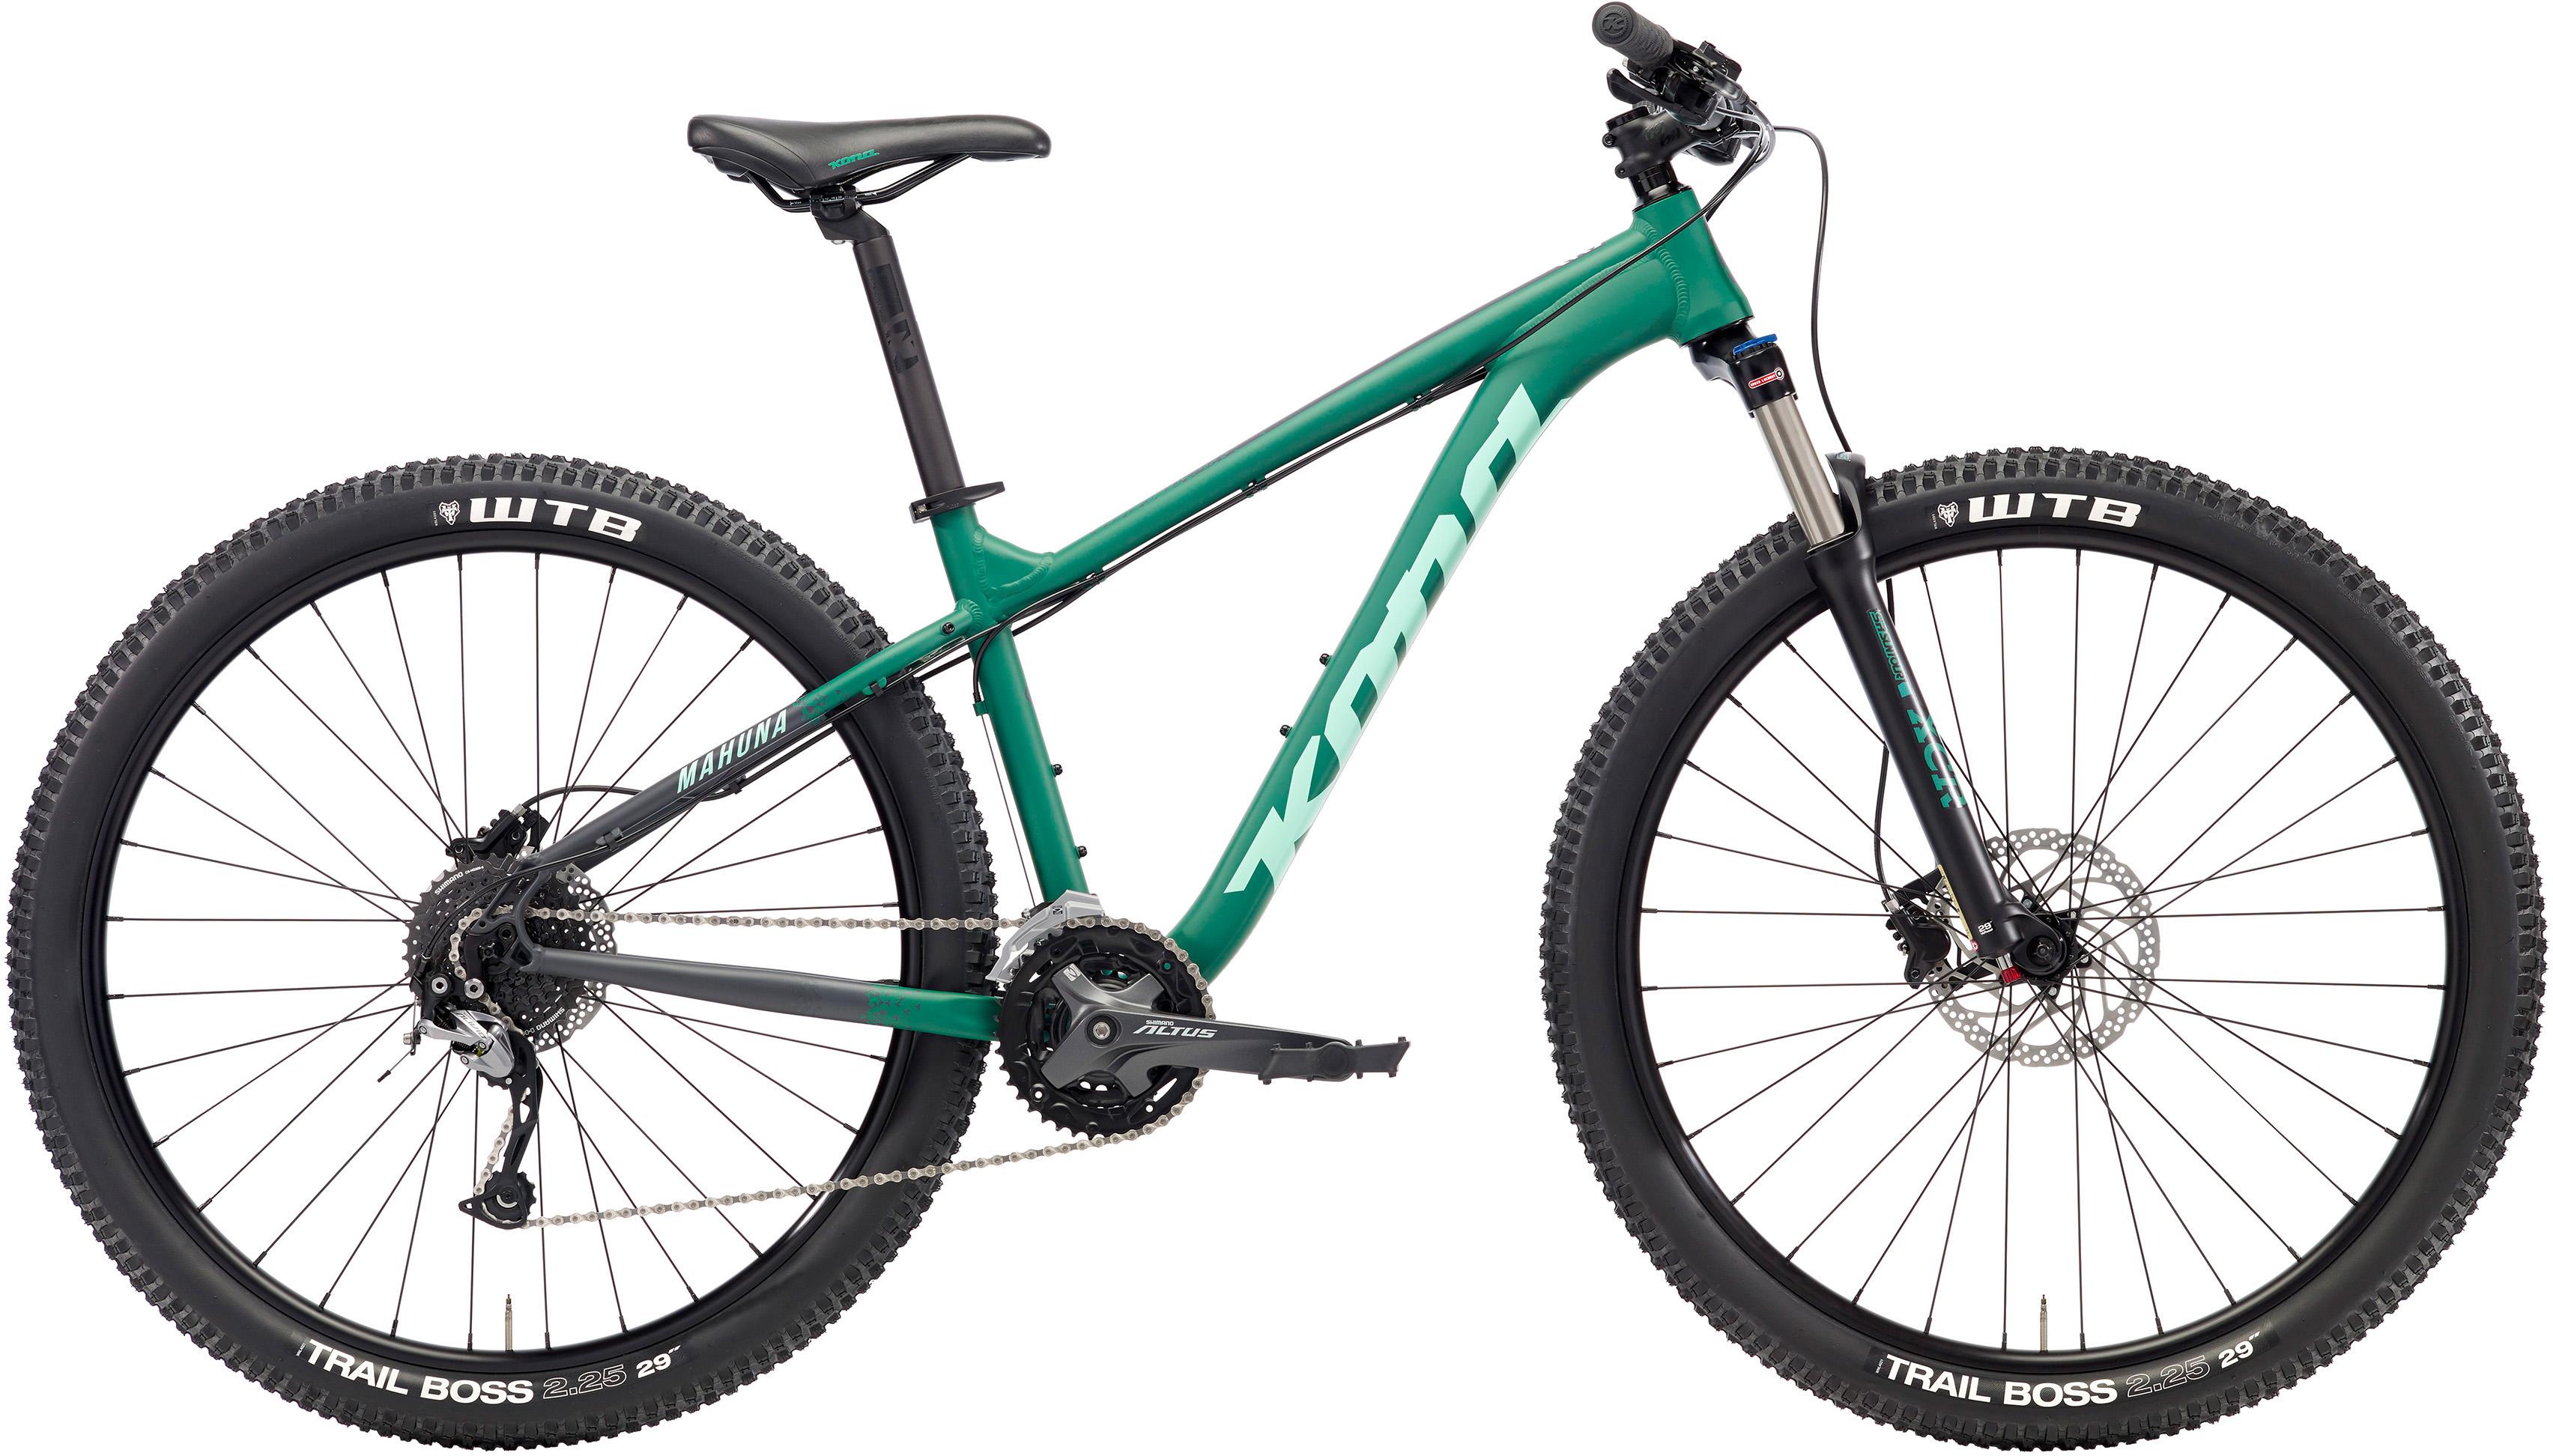 3408x1944 Wiggle Kona Mahuna (2018) Mountain Bike Hard Tail Mountain Bikes